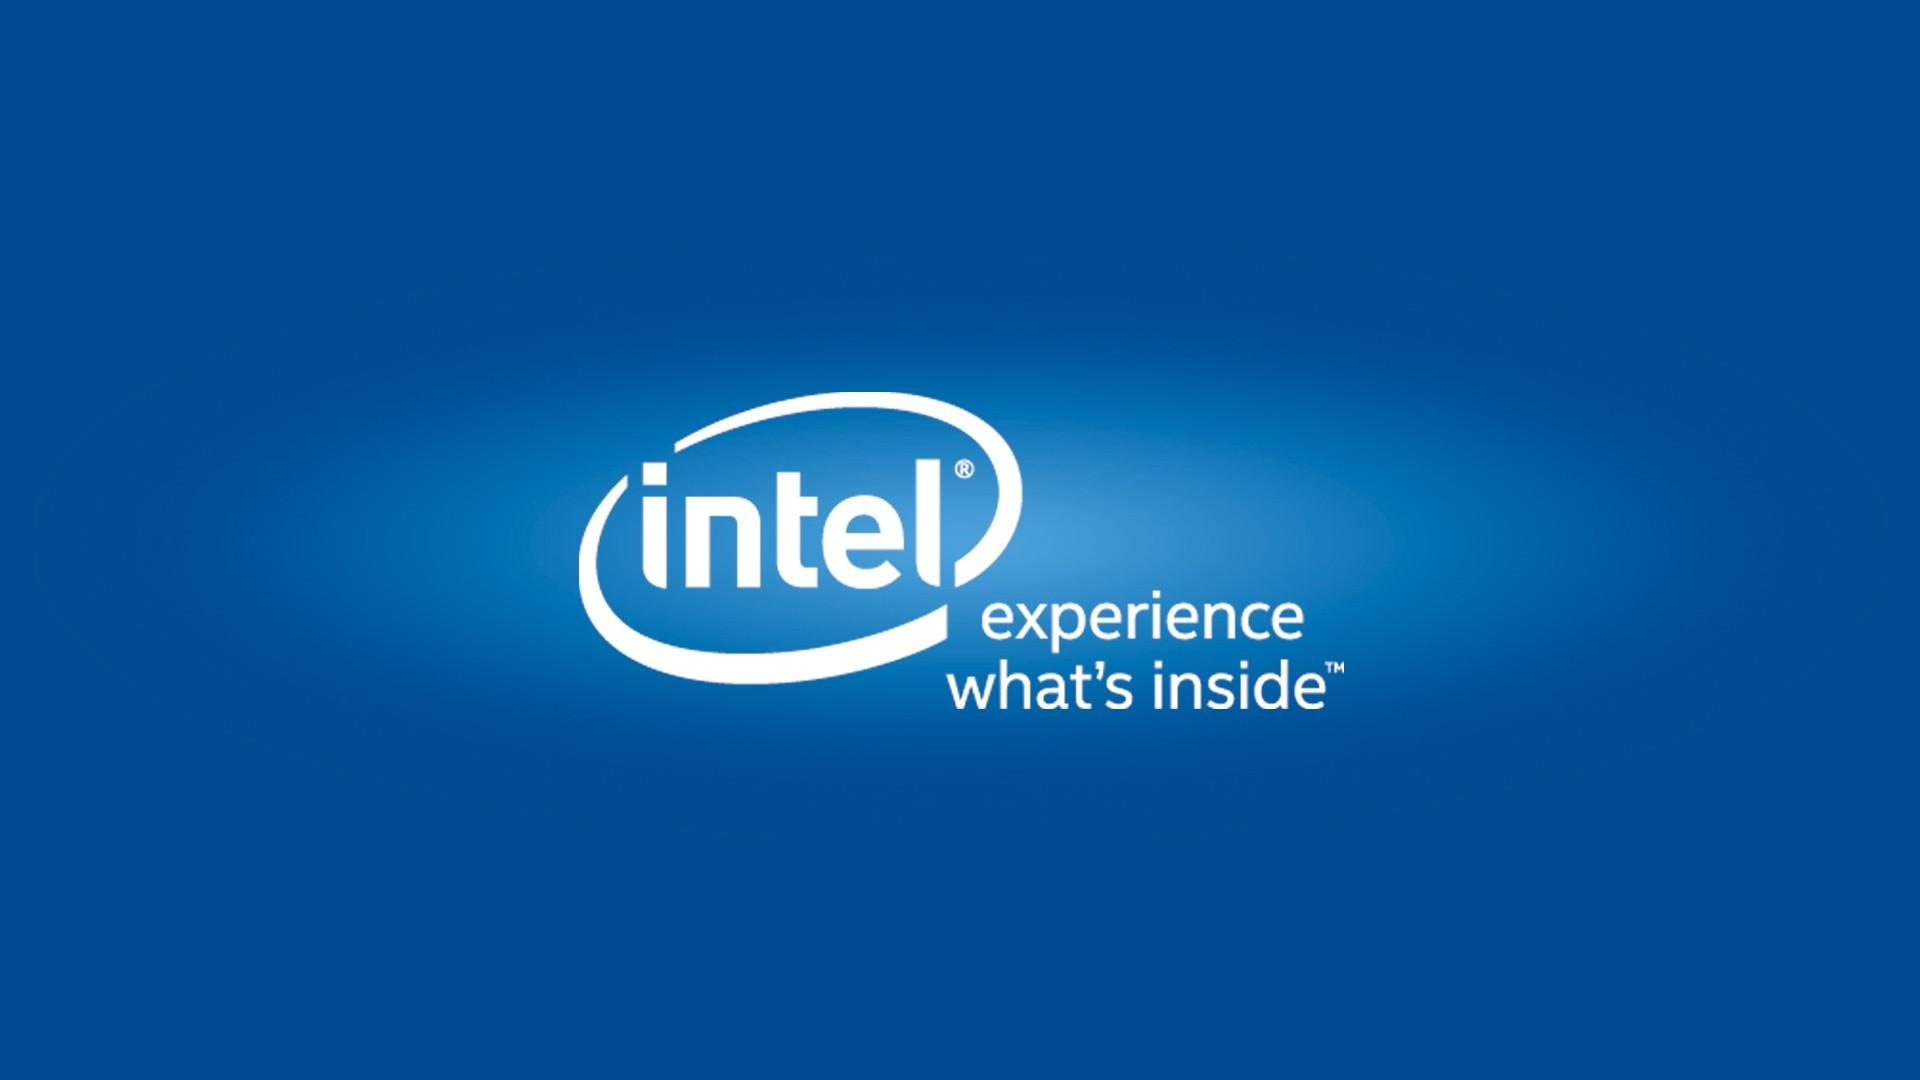 Intel Wallpaper Download Full